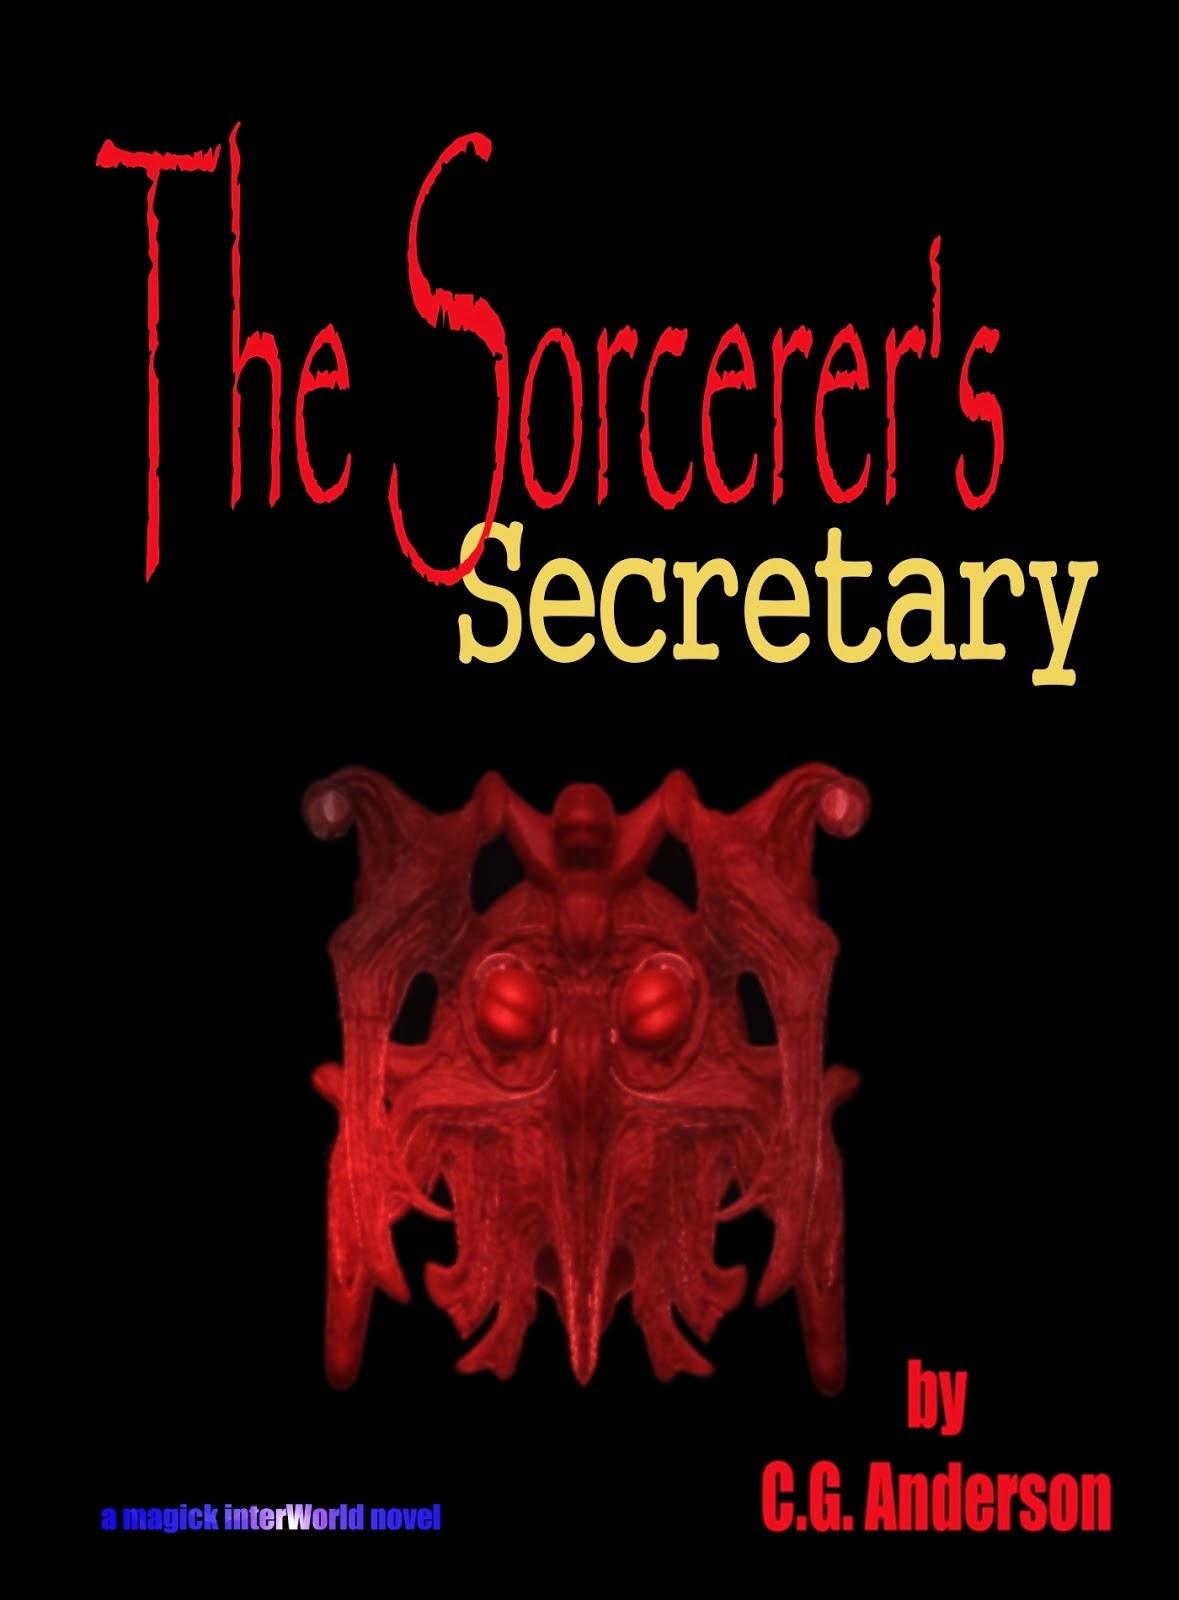 The Sorcerer's Secretary